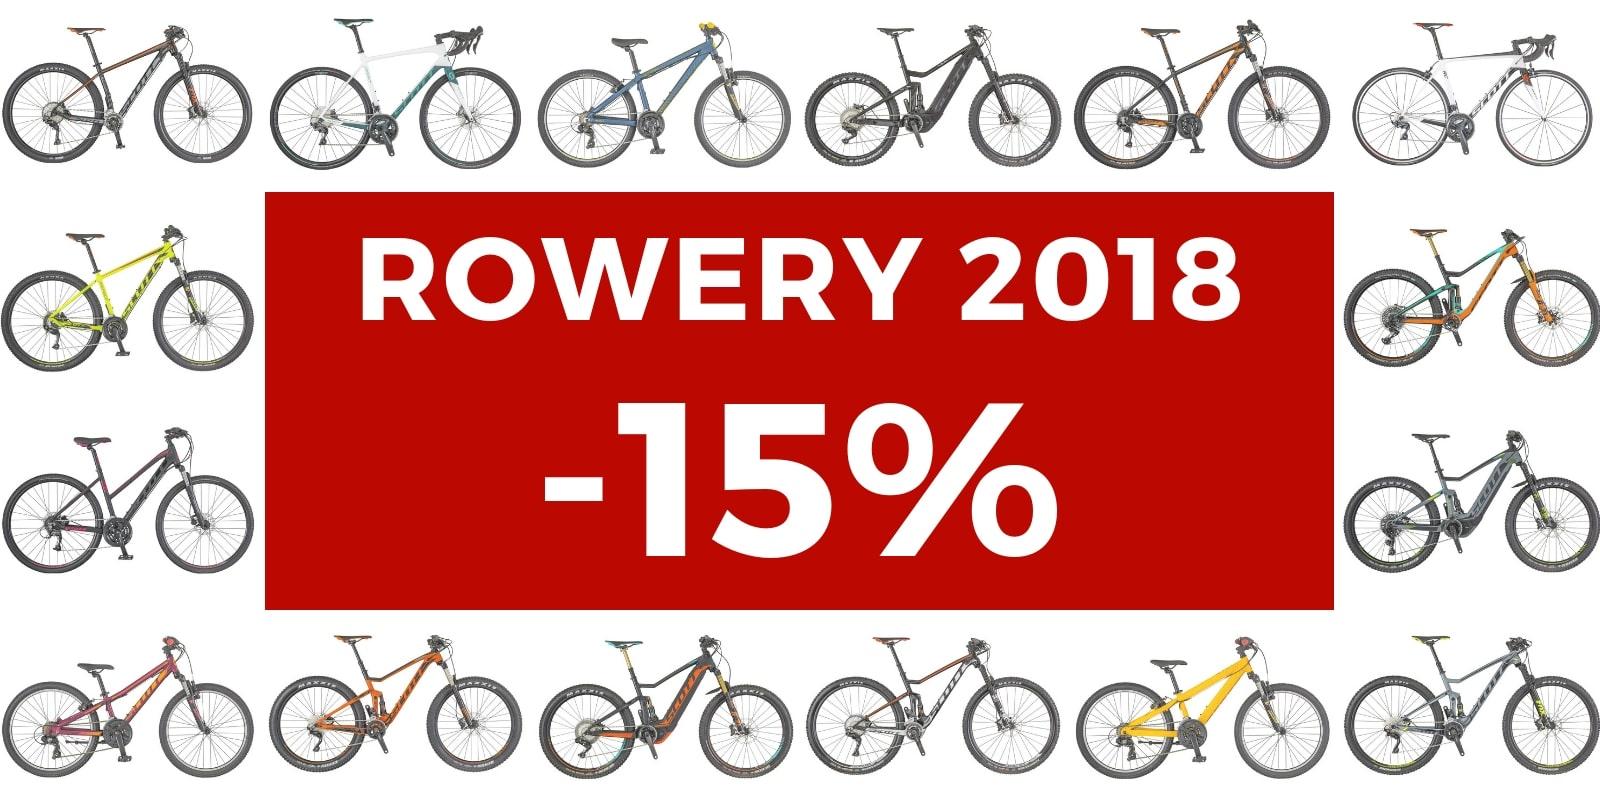 Rowery 2018 -15%